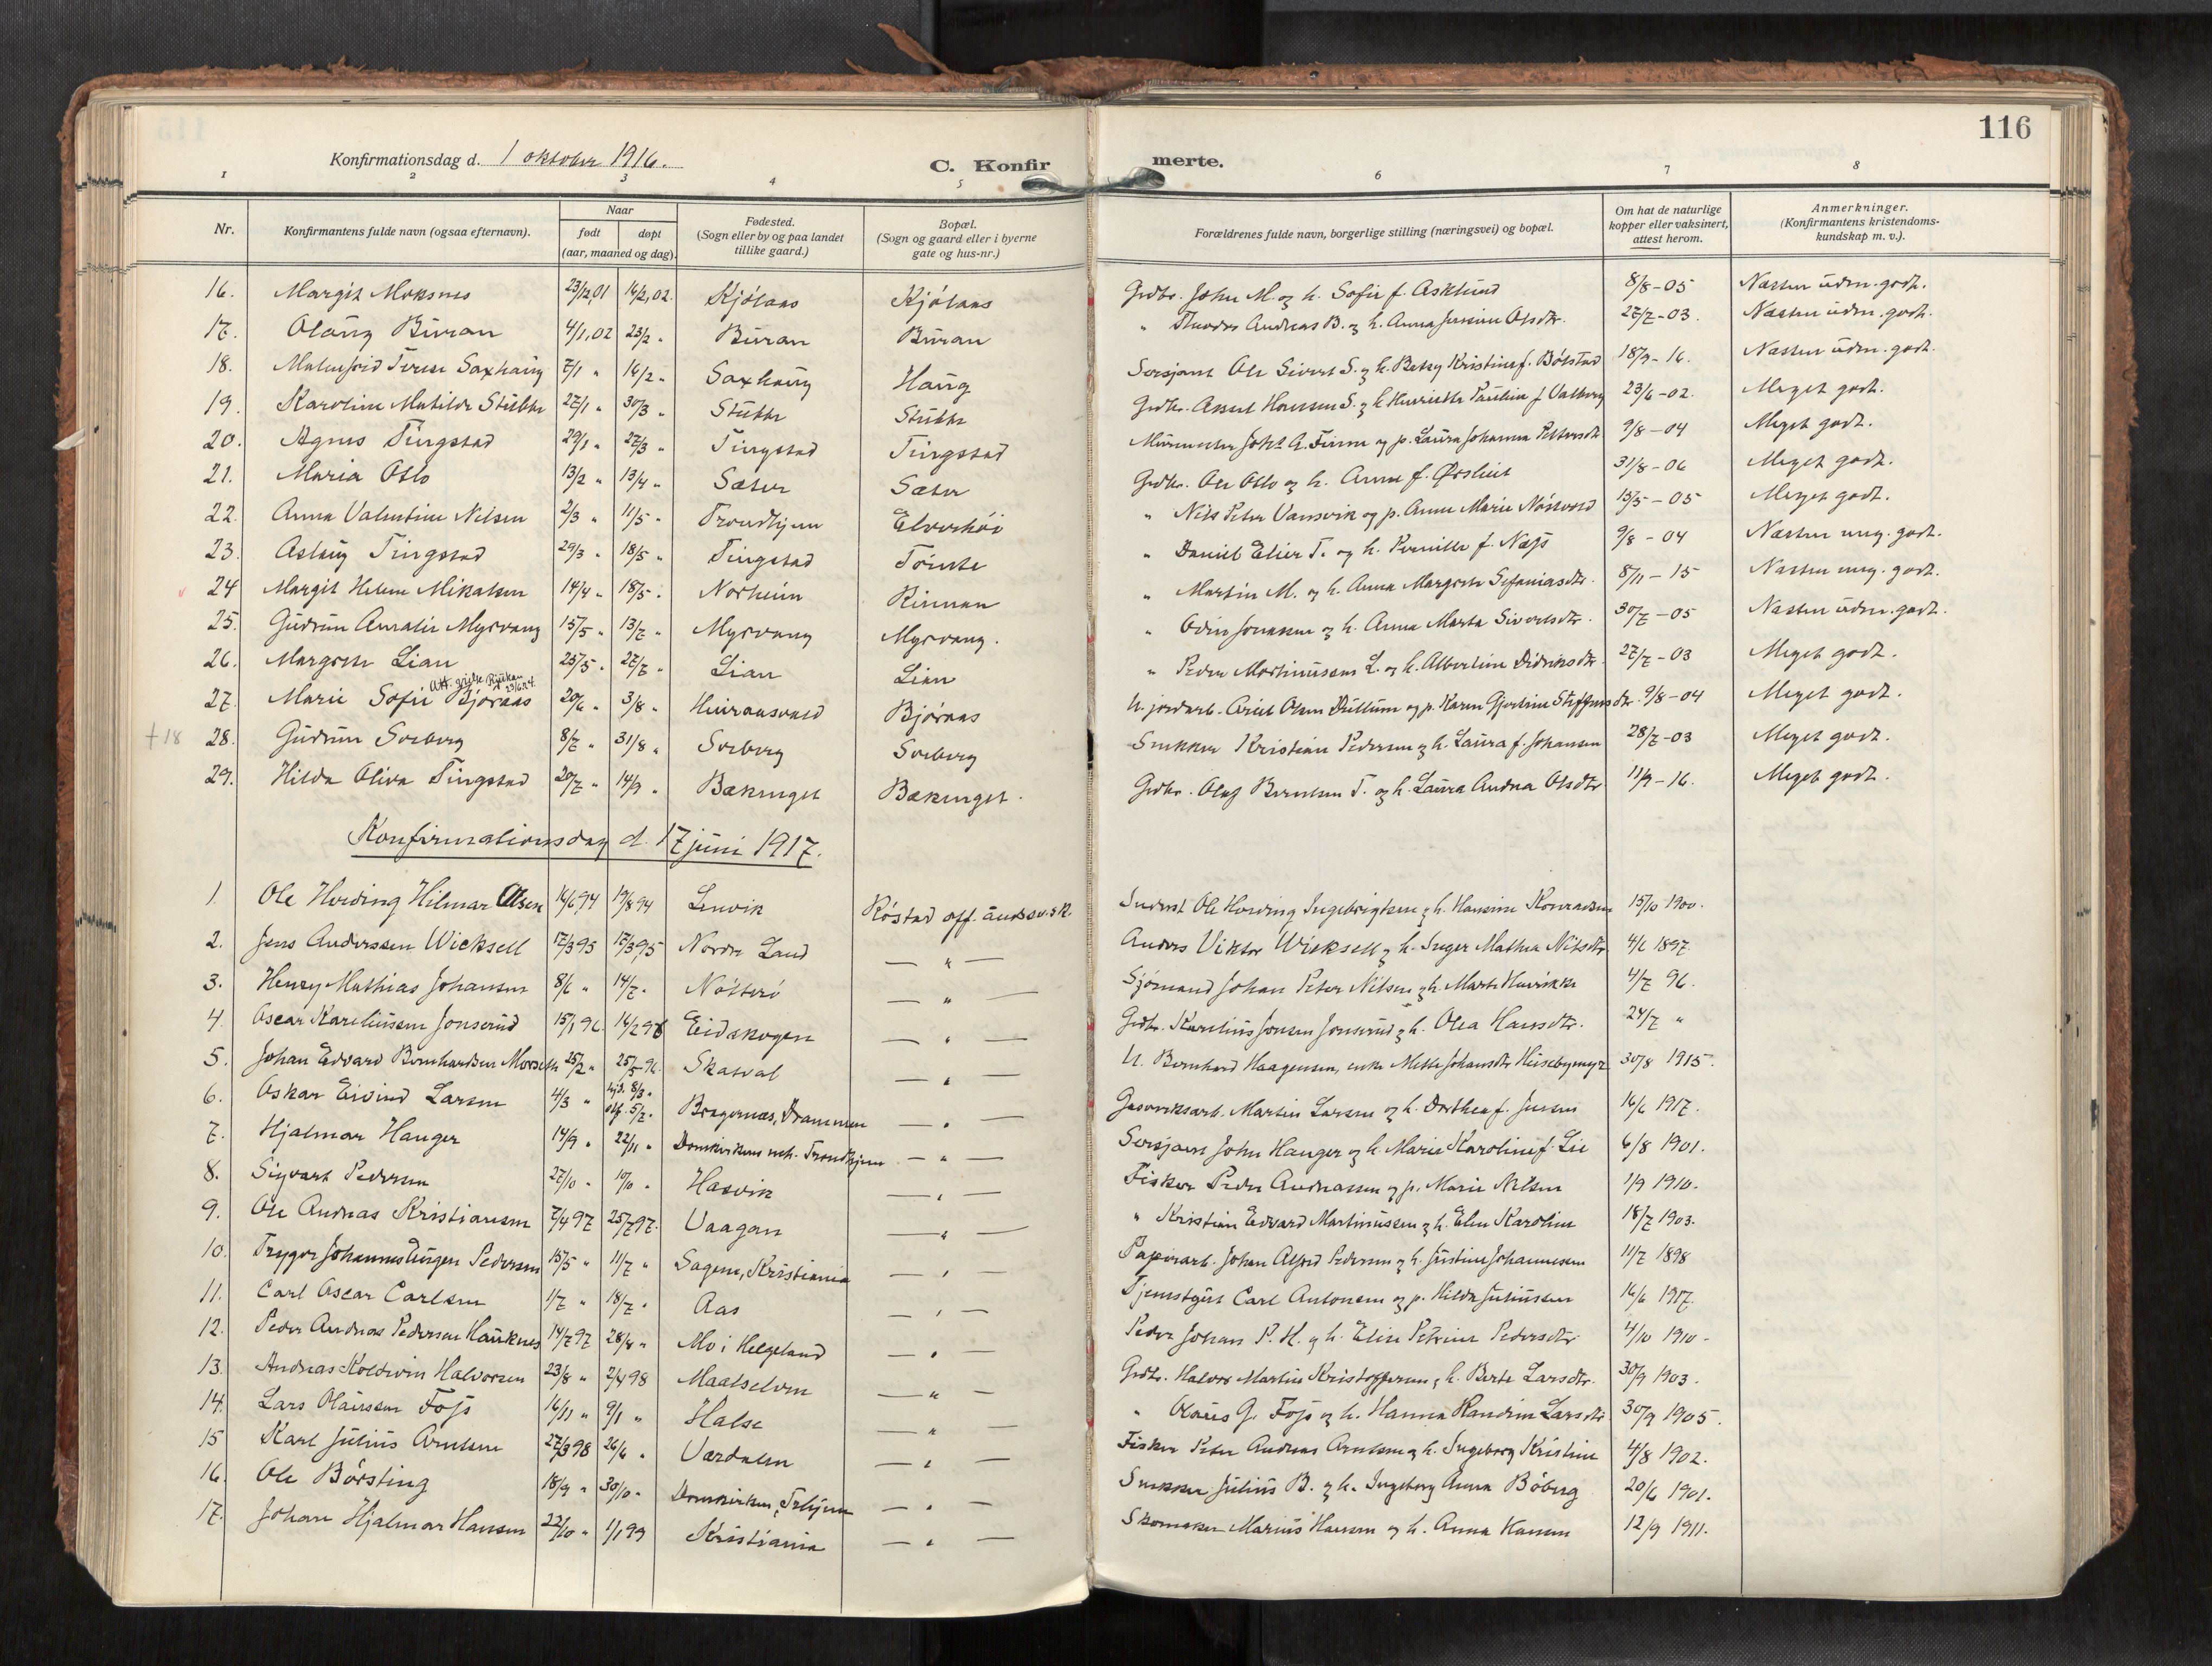 SAT, Levanger sokneprestkontor*, Parish register (official) no. 1, 1912-1935, p. 116